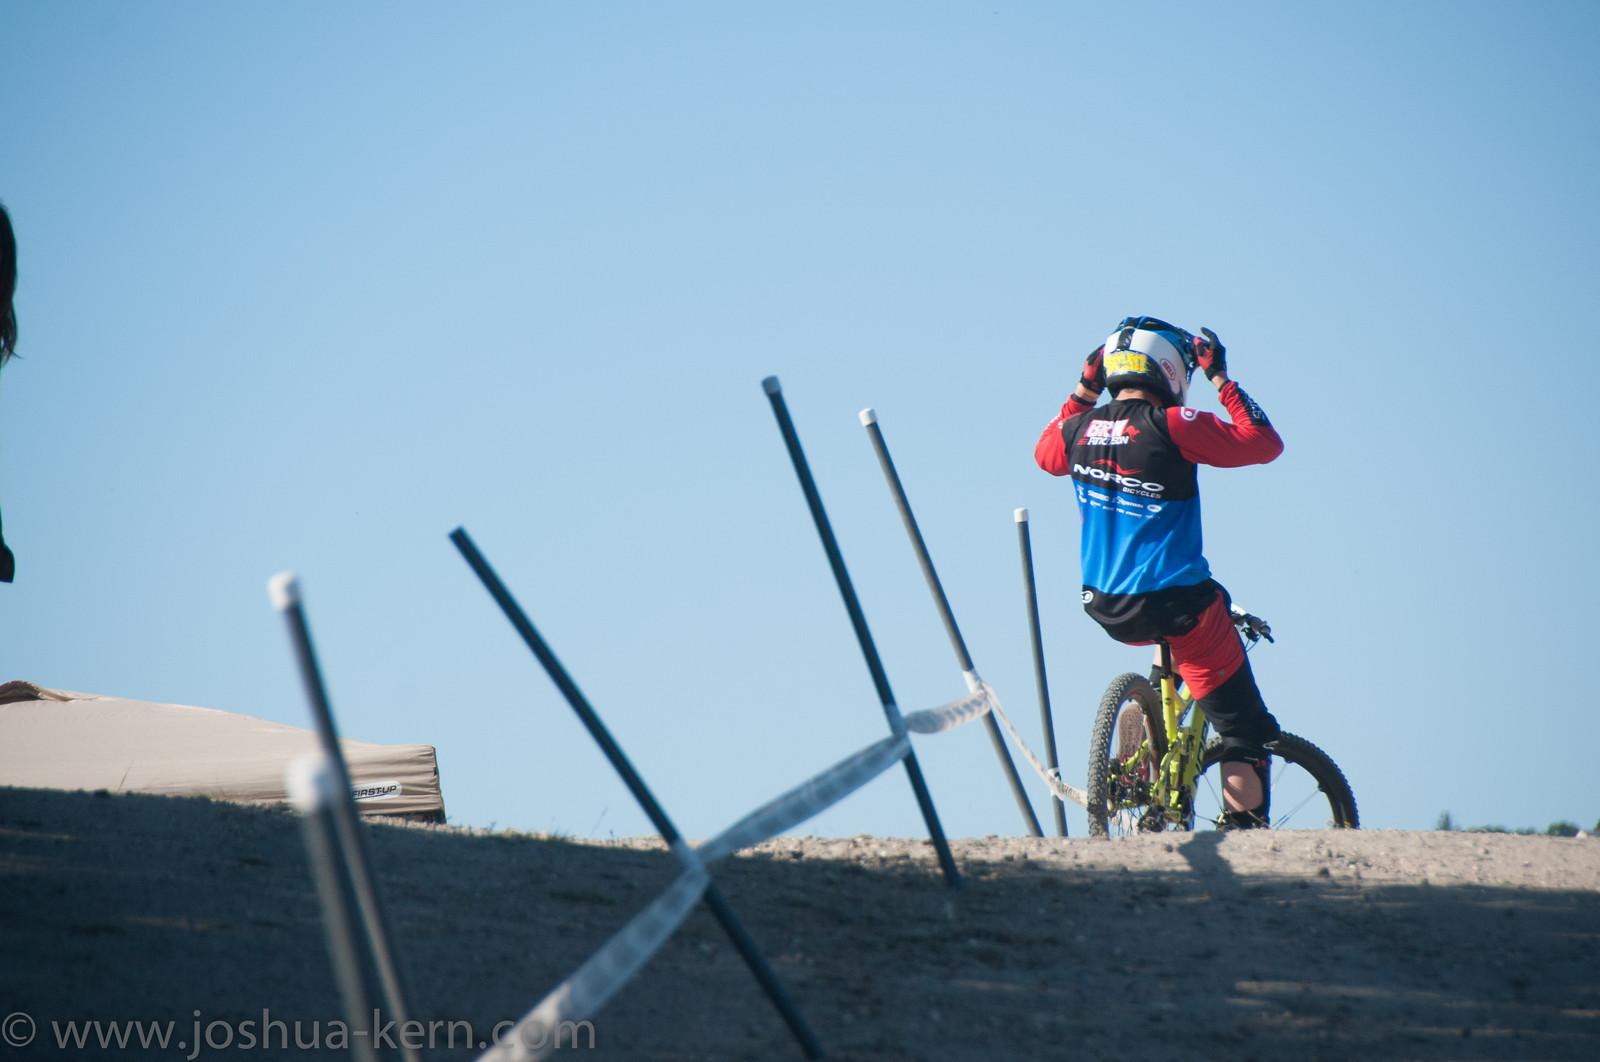 4-19-13DHPractice (12 of 36) - jkern620 - Mountain Biking Pictures - Vital MTB